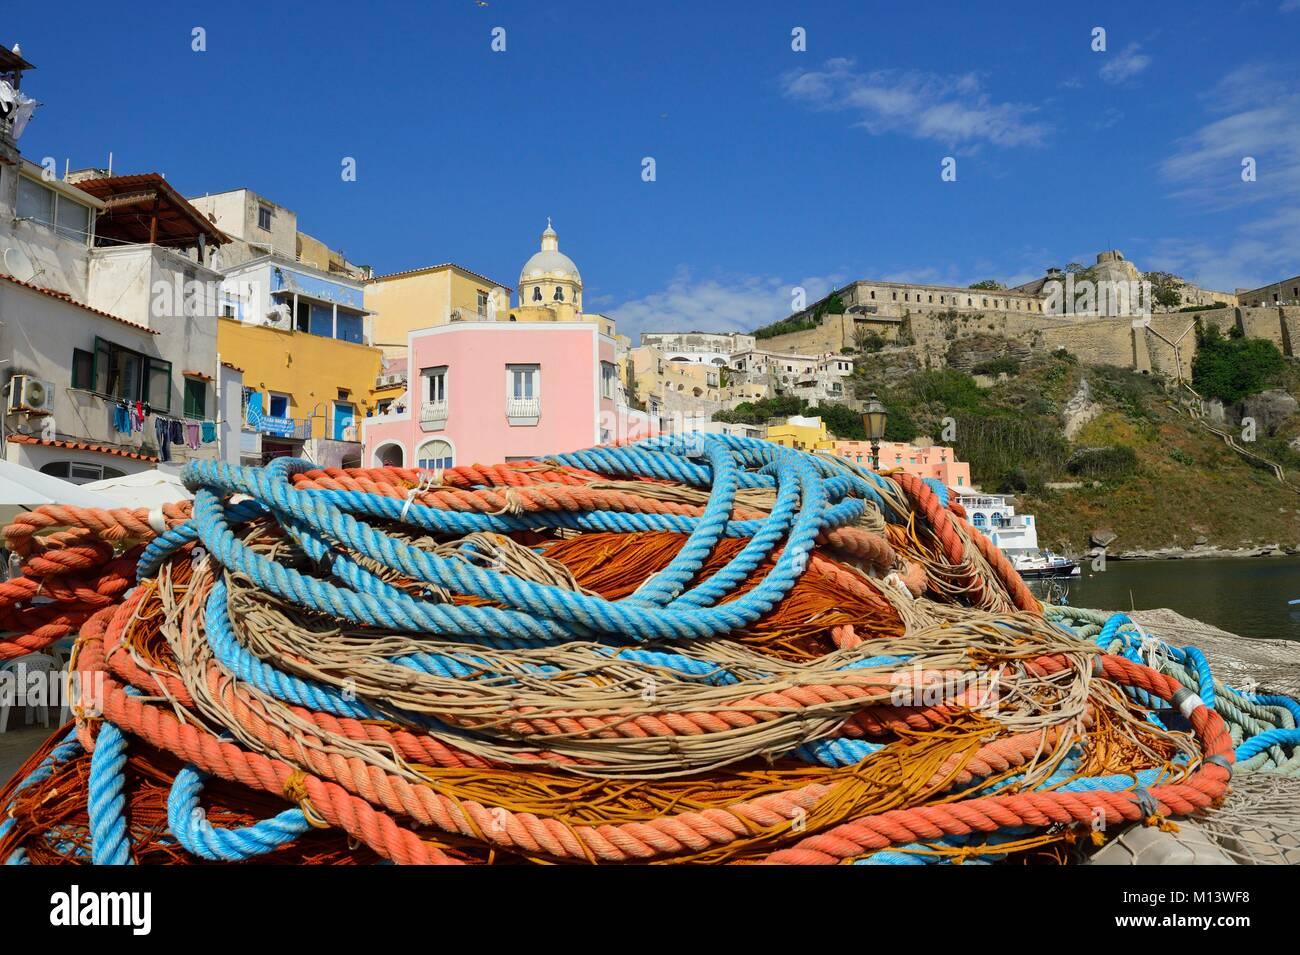 Italy, Campania, Gulf of Naples, Procida Island, Corricella small fishing harbour - Stock Image